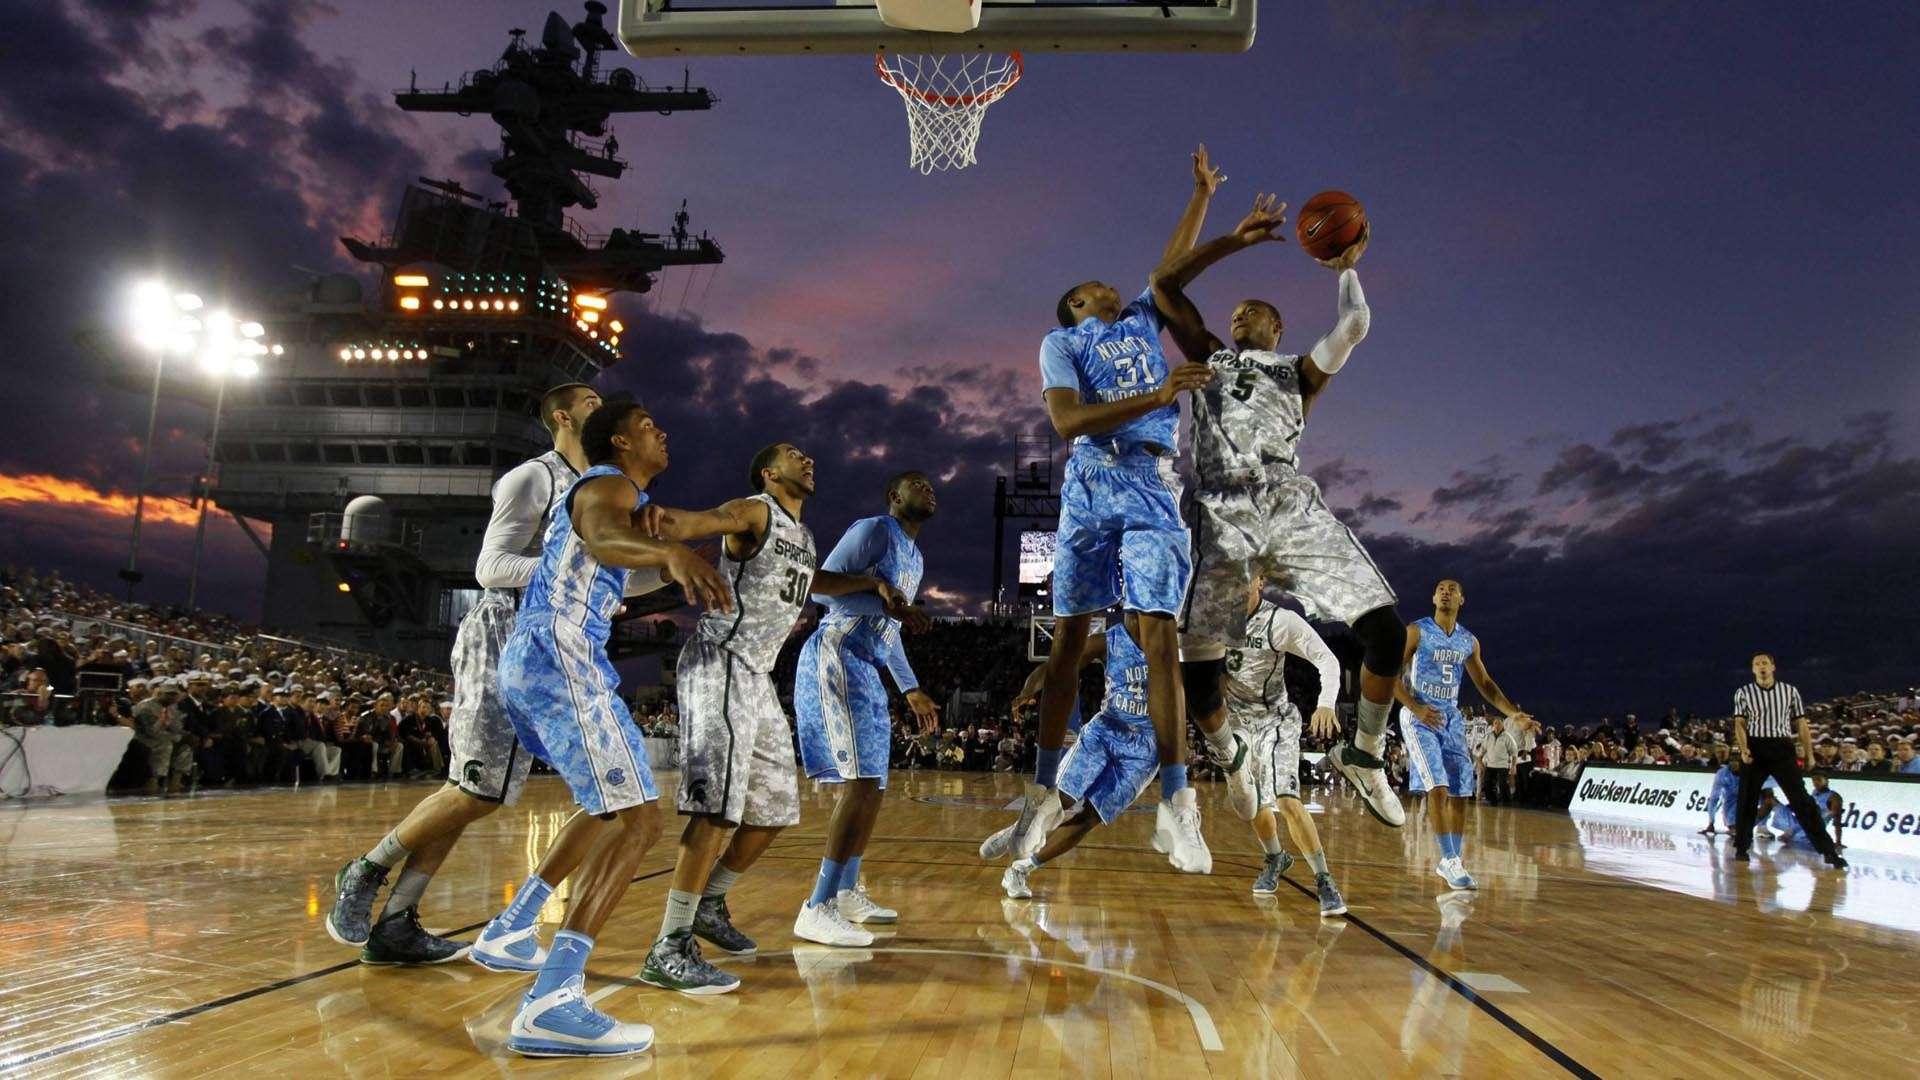 College basketball game on an aircraft carrier HD Wallpaper 1920x1080